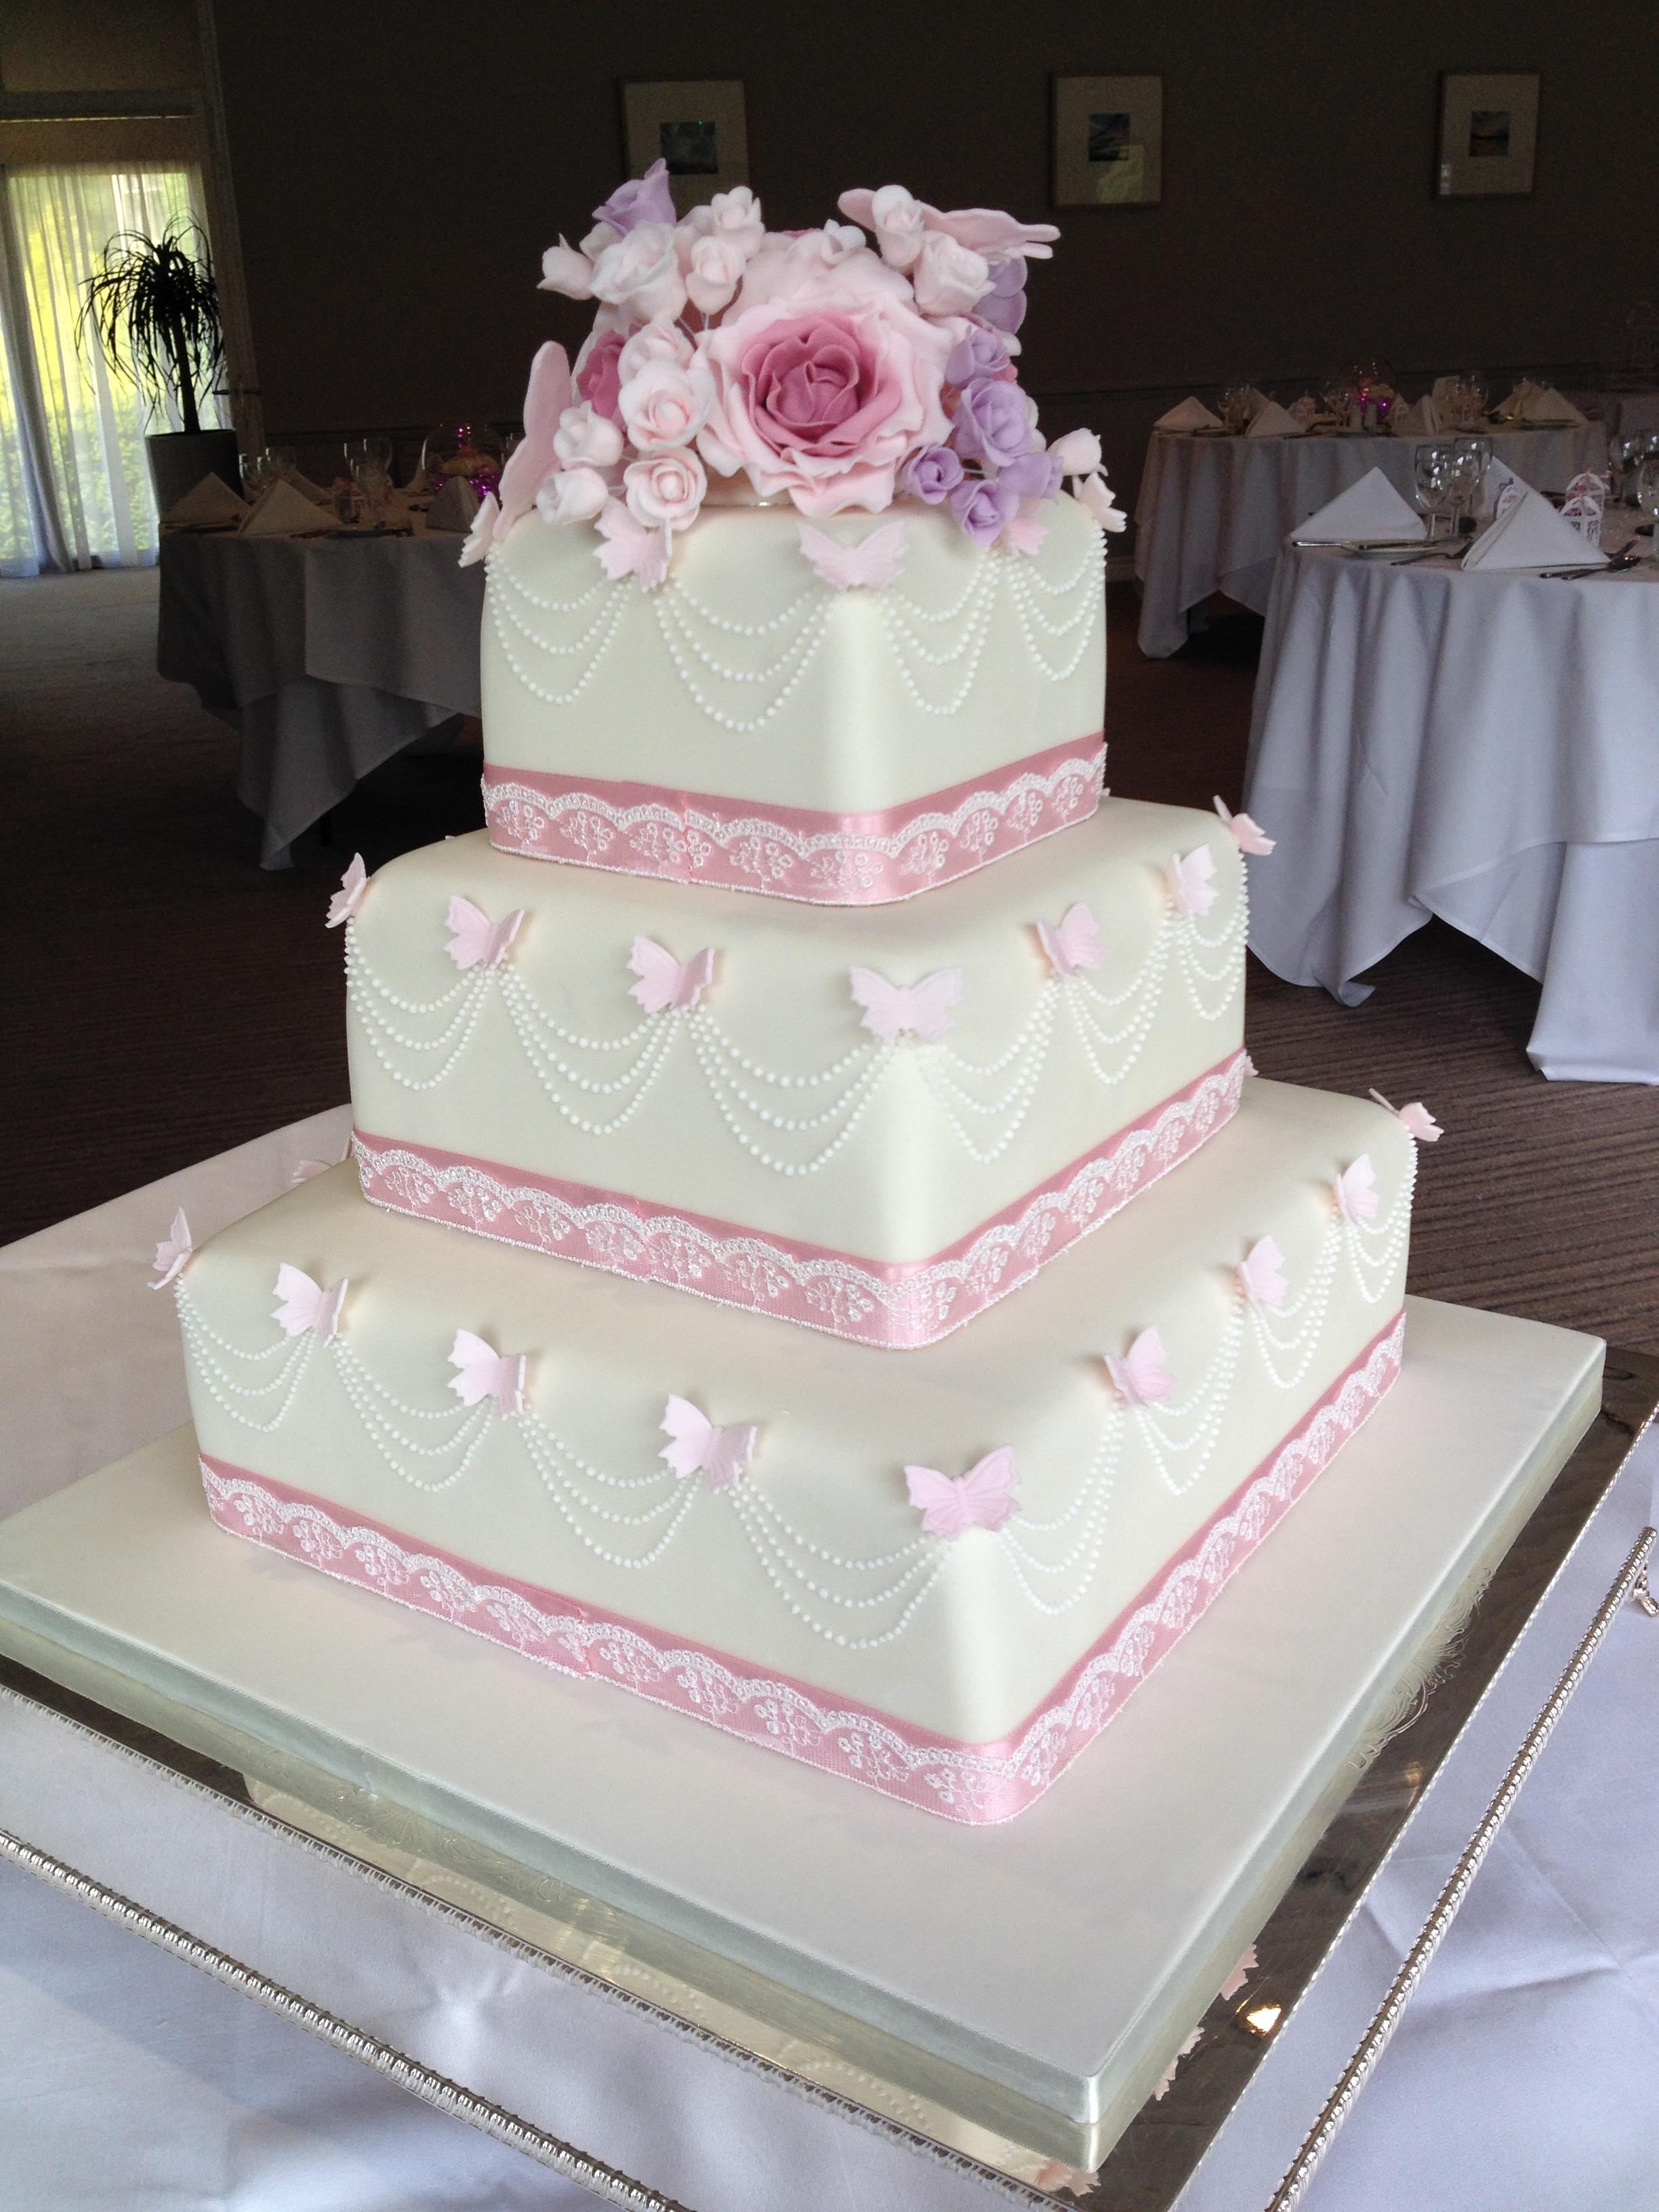 Draped Pearls & Butterflies Wedding Cake